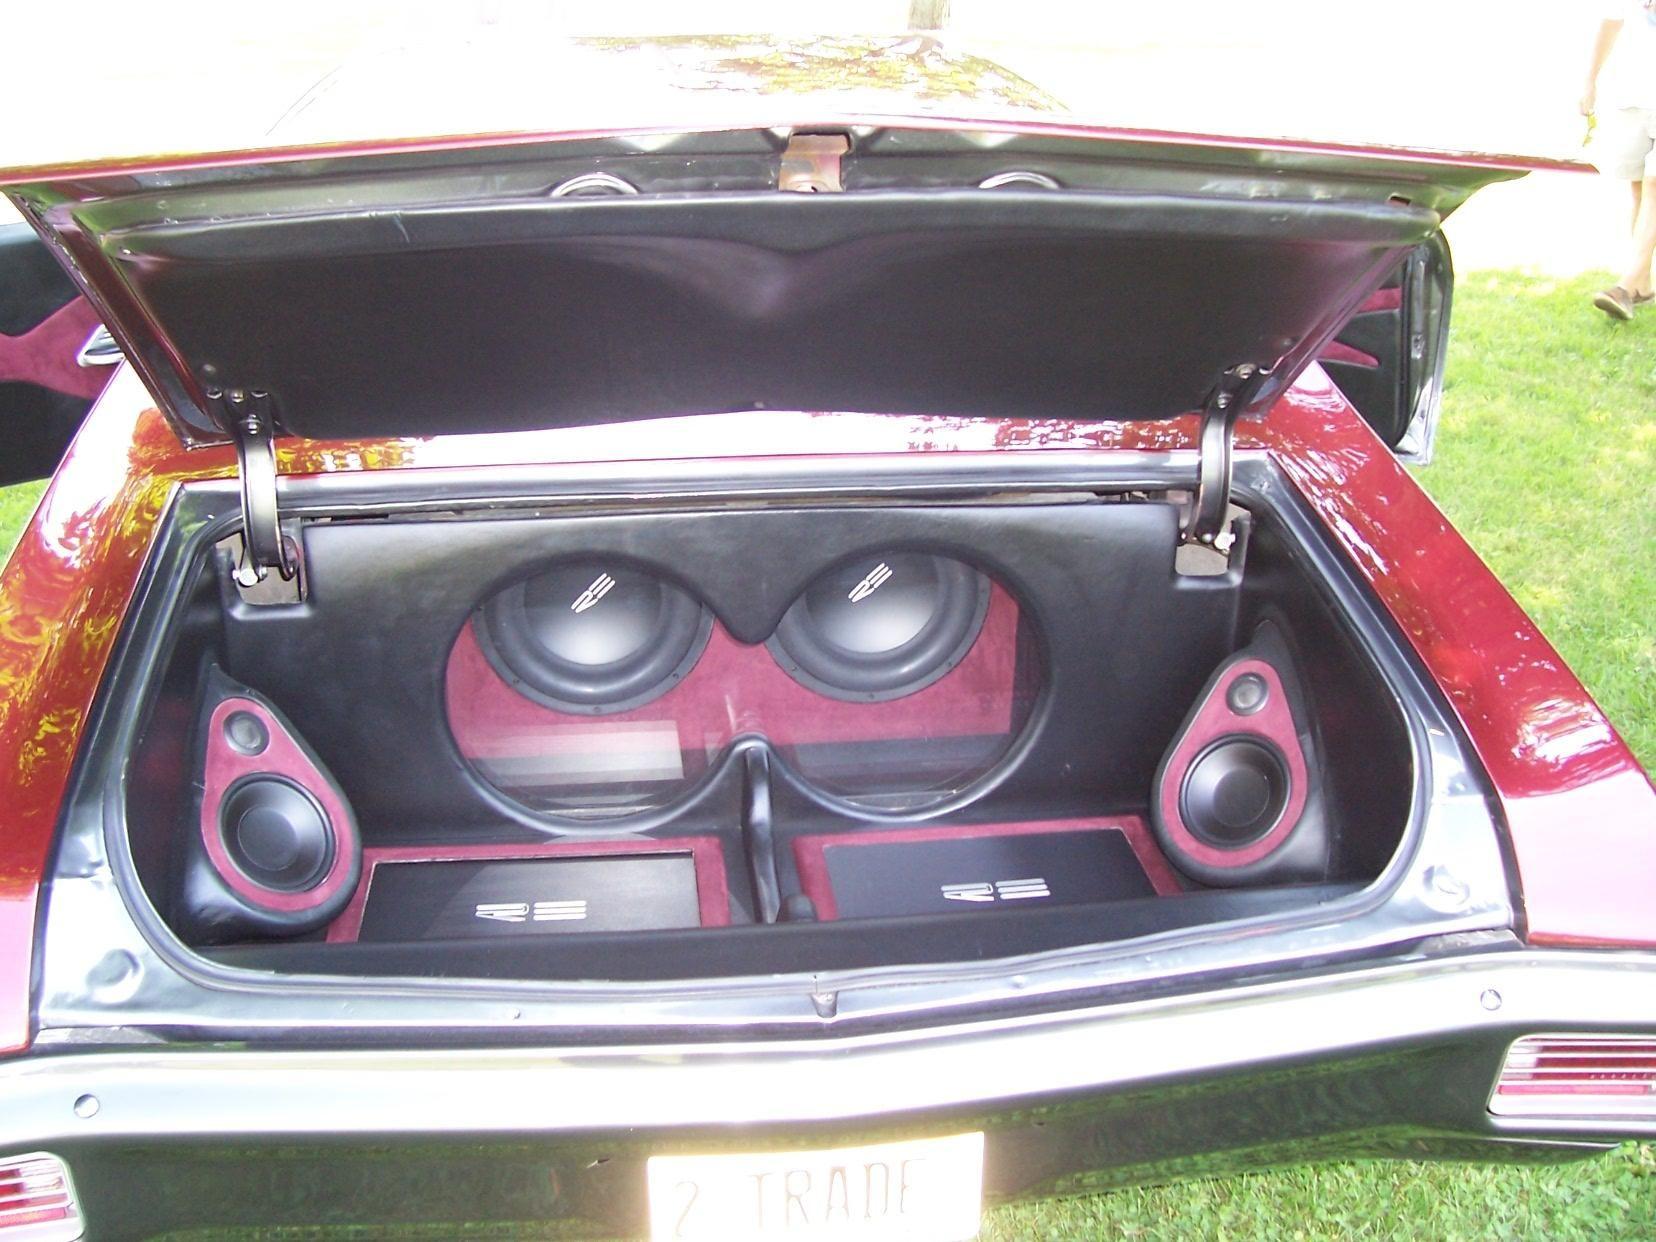 hight resolution of 70 chevelle car audio install re audio fiberglass trunk plexiglass window subwoofers subs